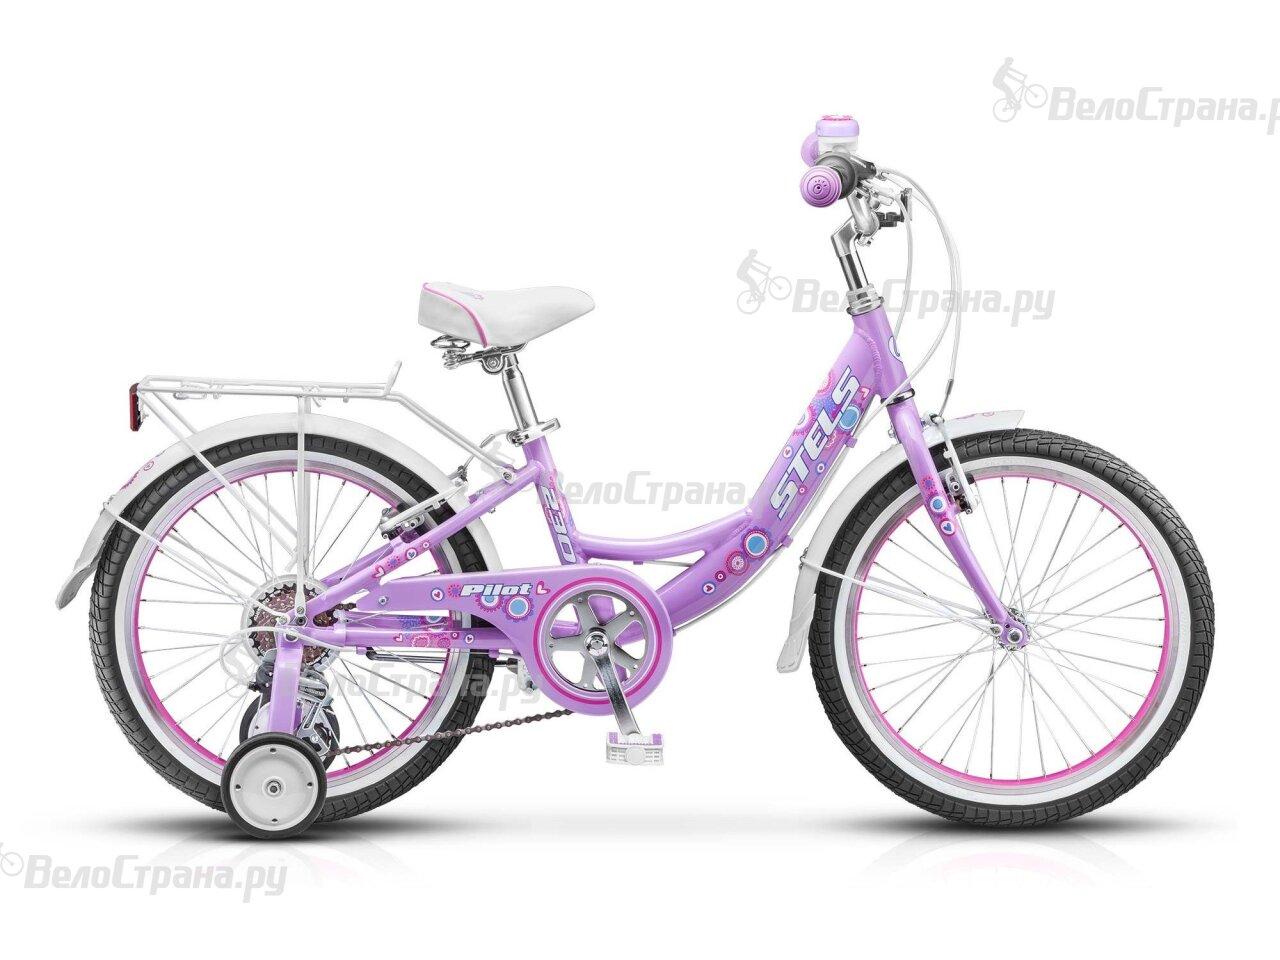 Велосипед Stels Pilot 230 Lady (2017) велосипед stels pilot 230 lady v020 2018